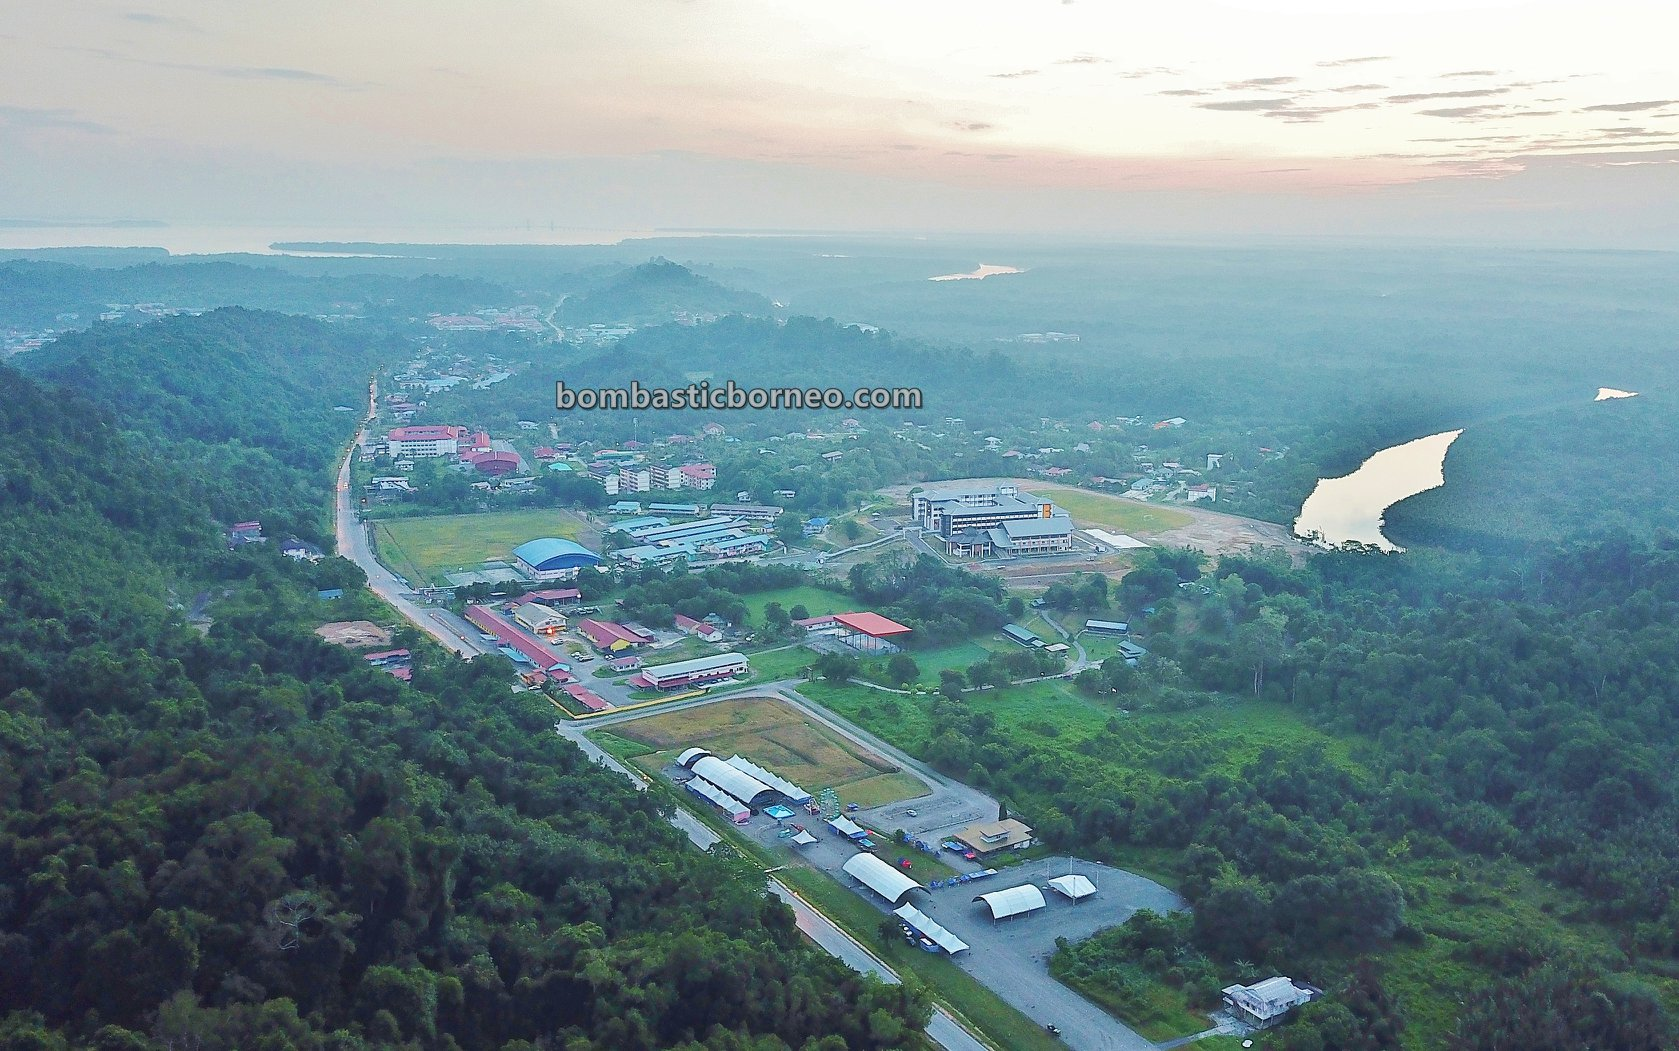 town, Taman Tasik Bukit Mas, trekking, hiking, adventure, nature, outdoor, exploration, Tourism, tourist attraction, Trans Border, 婆罗洲马来西亚, 砂拉越林梦